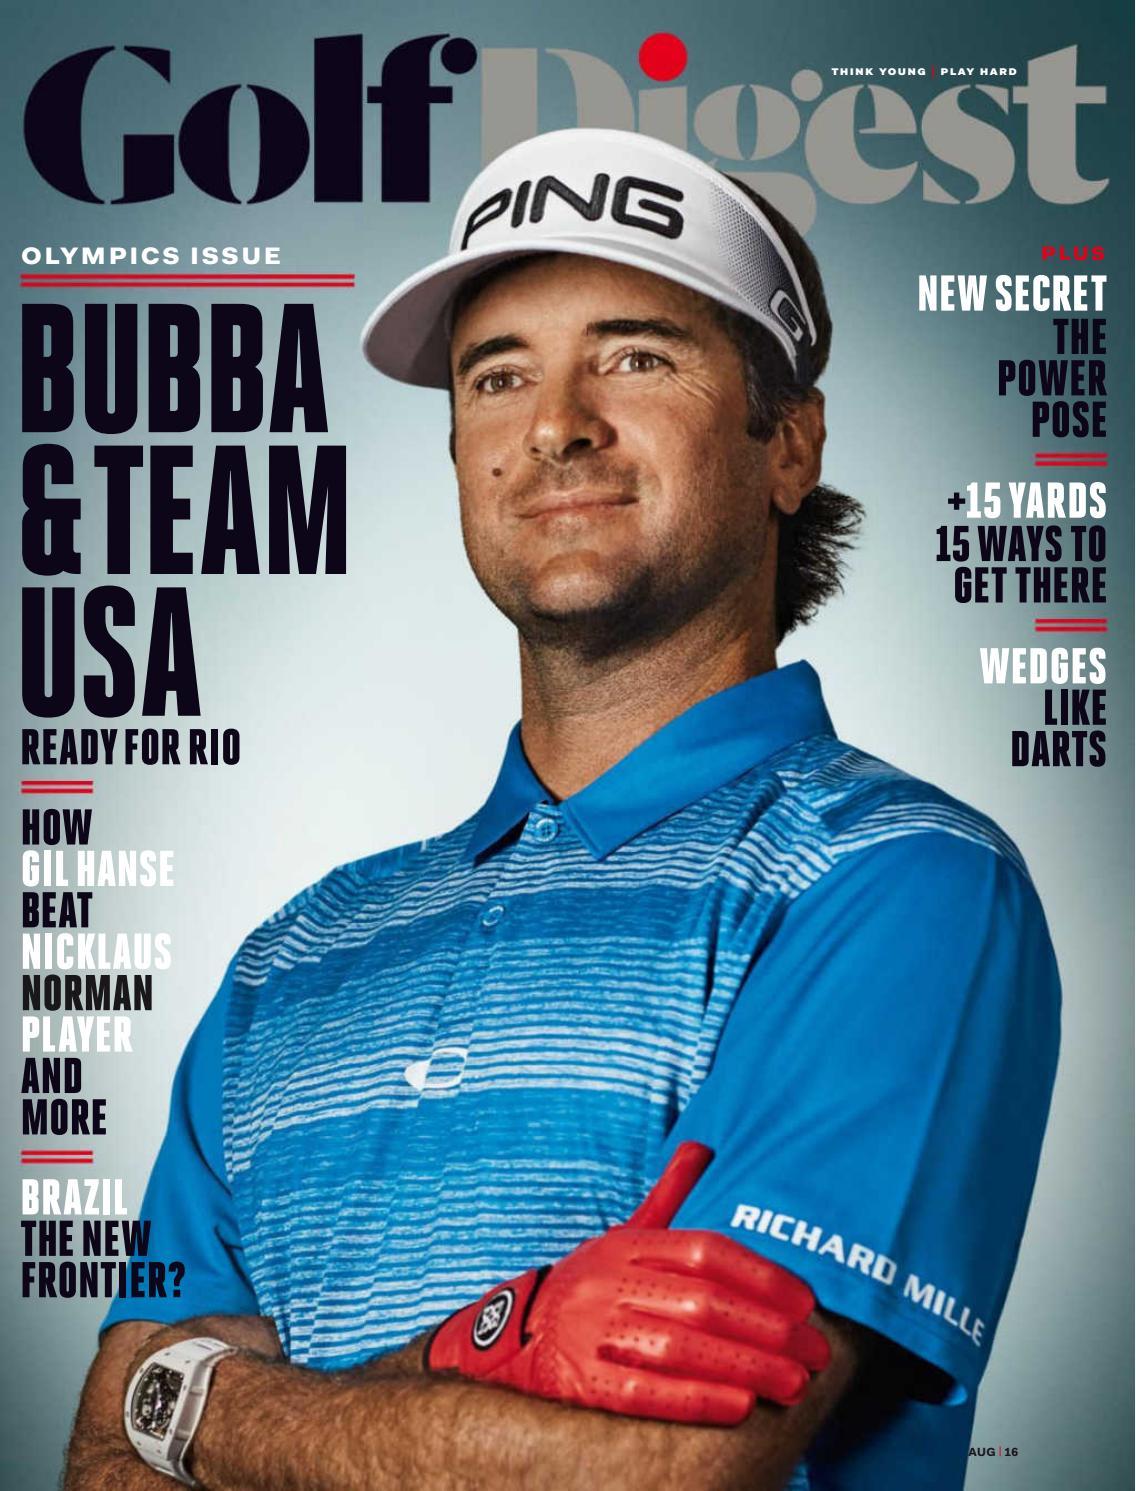 golf-digest-august-2016.jpg